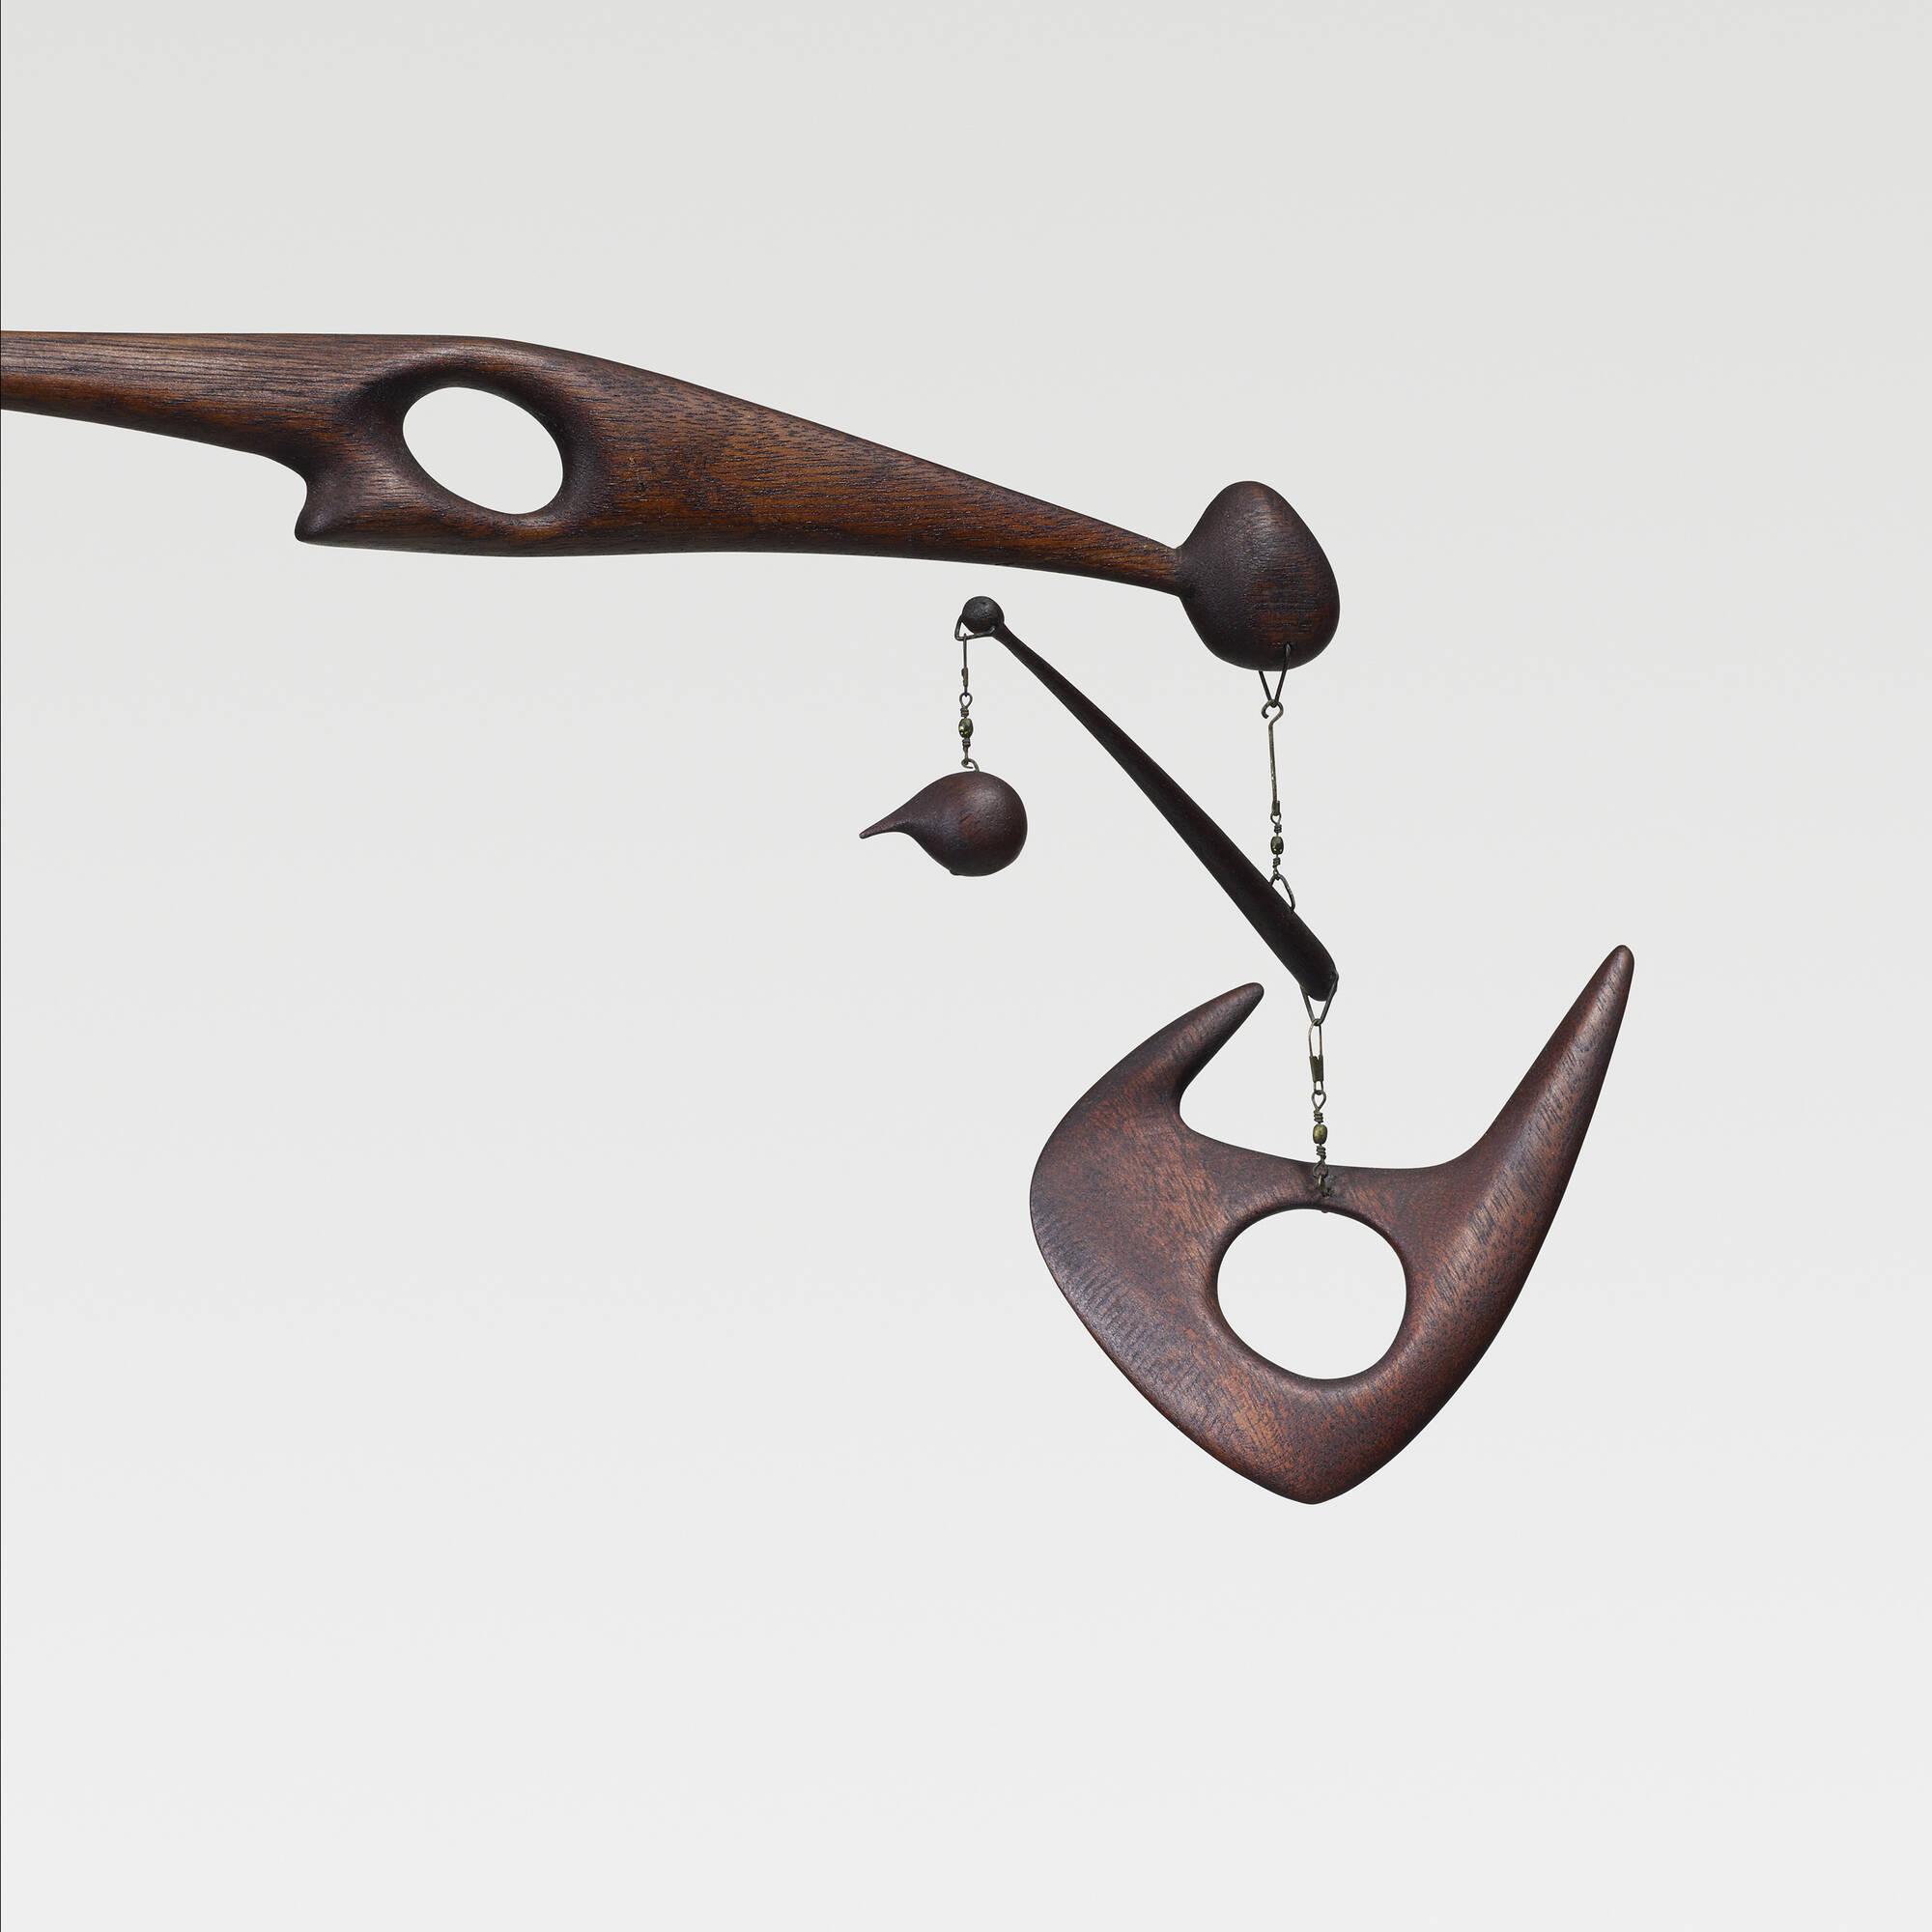 11: LEO AMINO, Untitled (mobile) < Design Masterworks, 19 May 2015